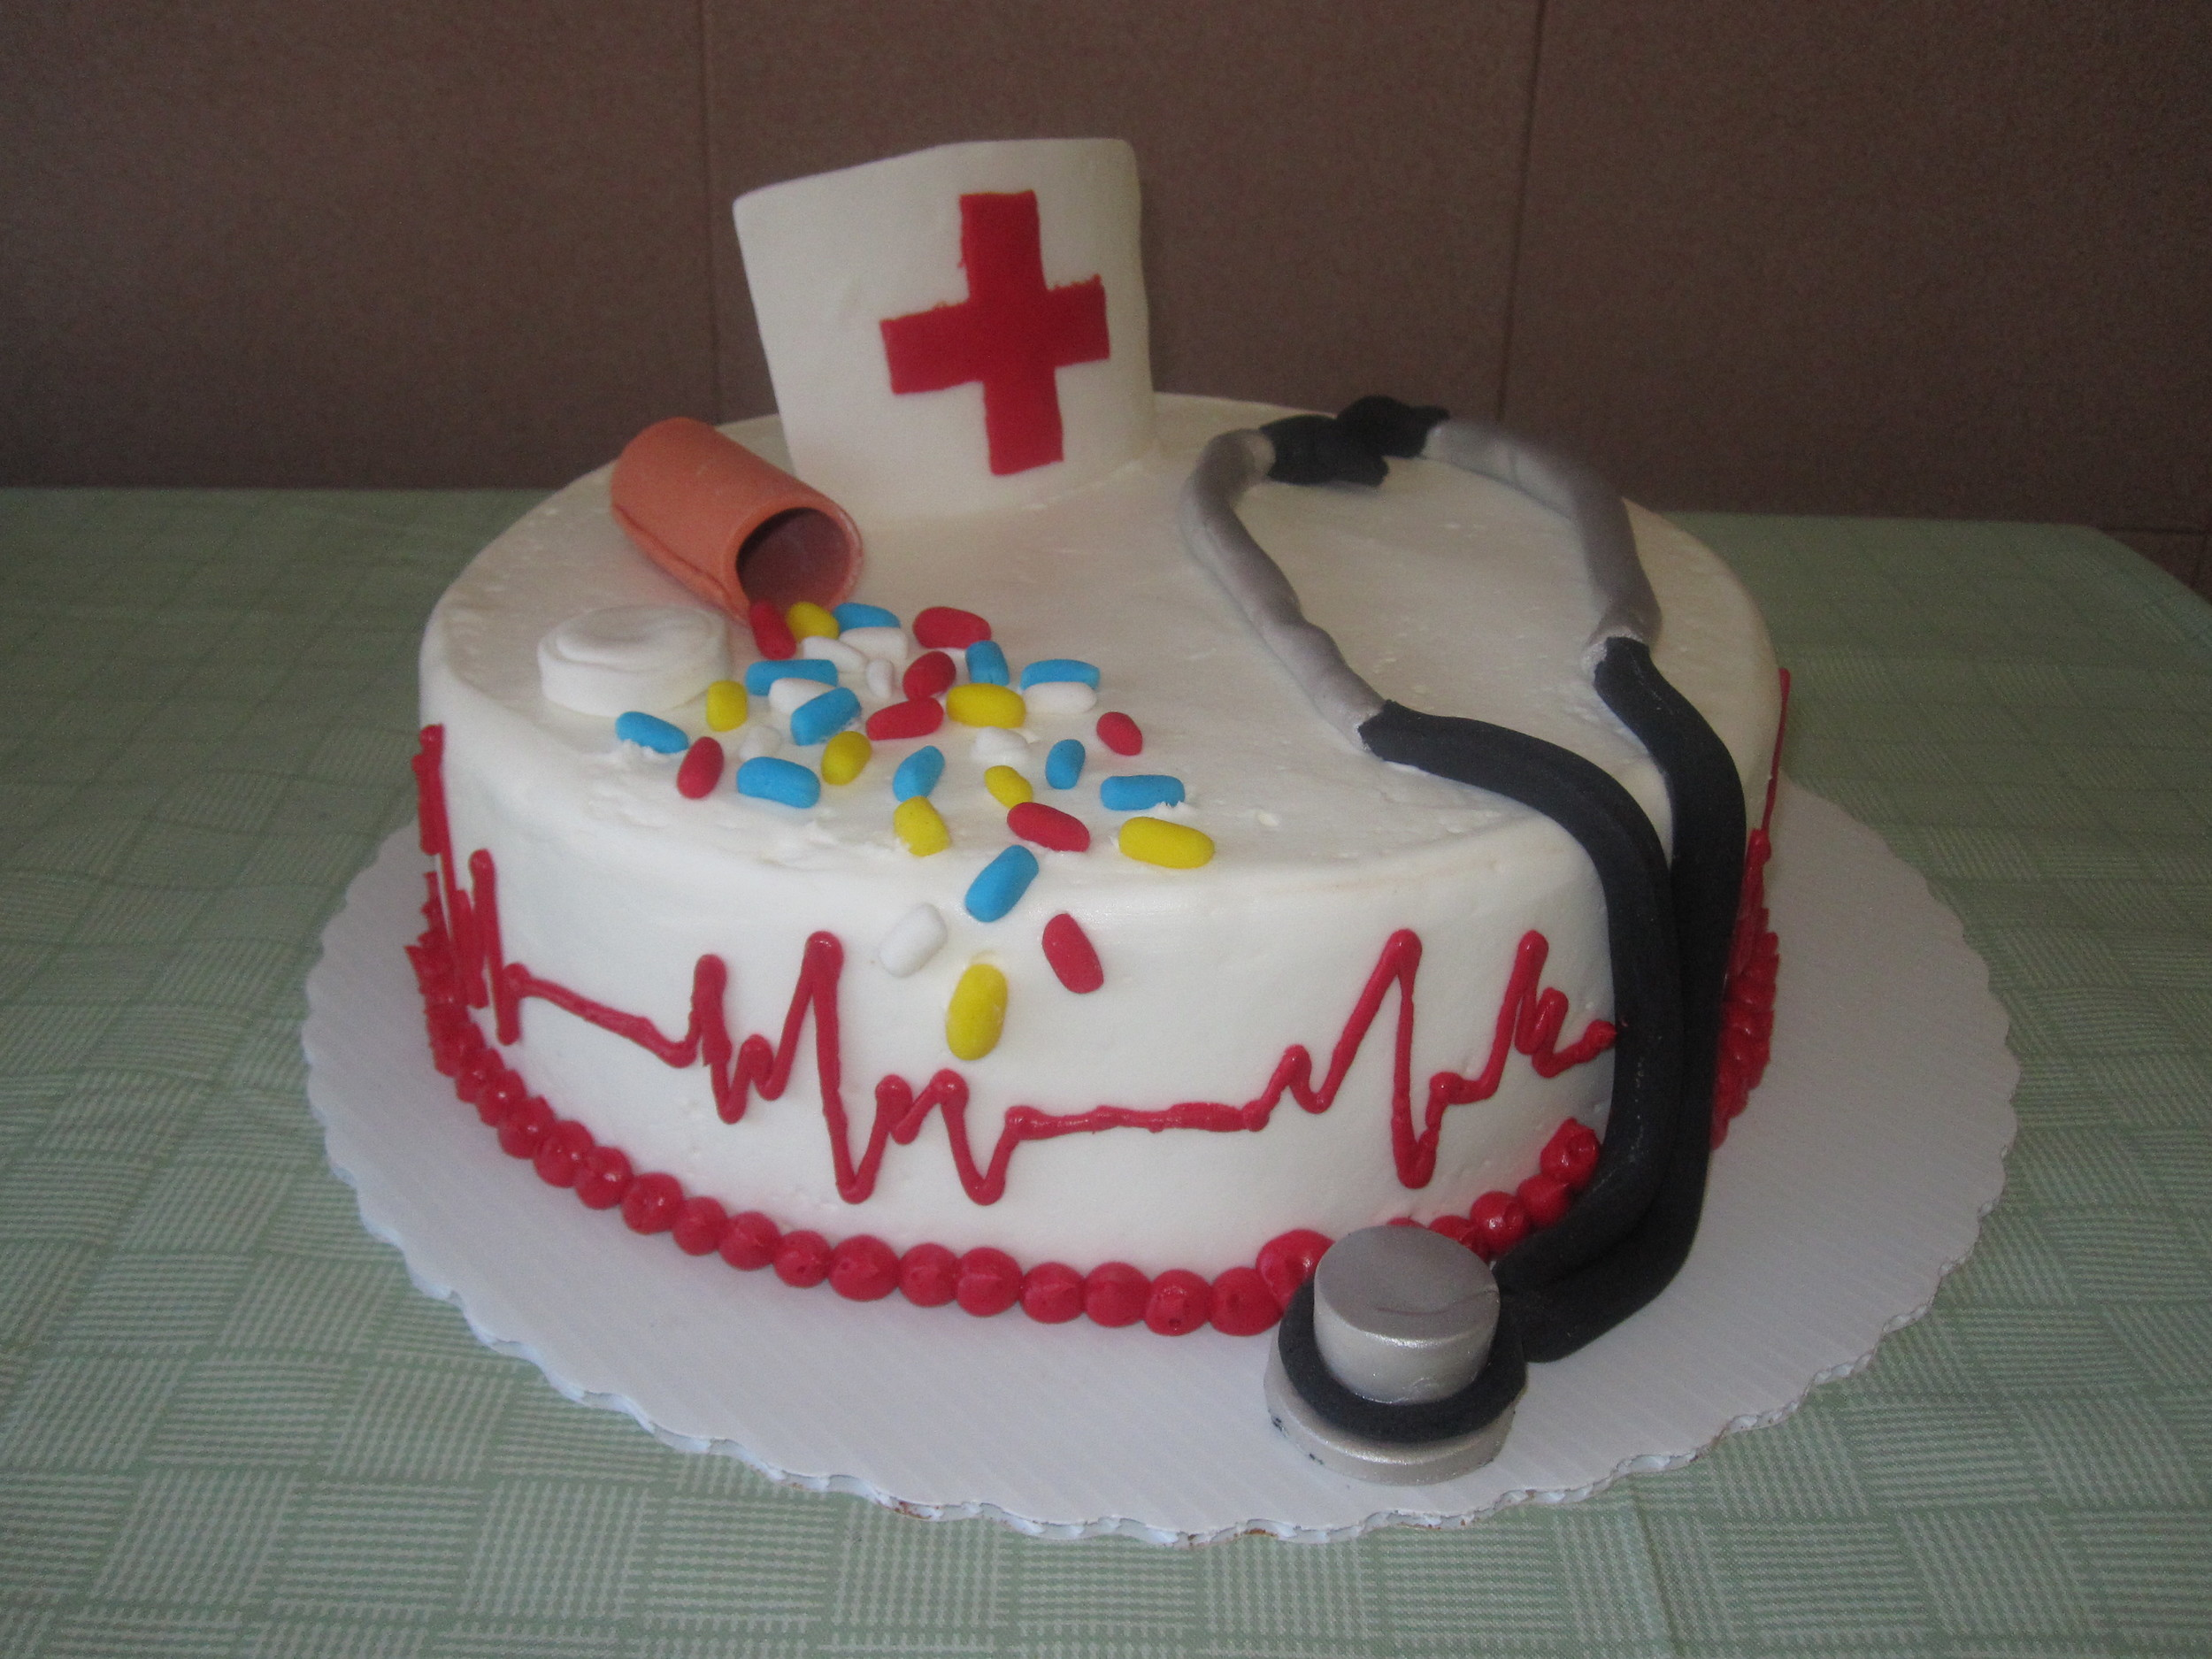 NurseCake.JPG